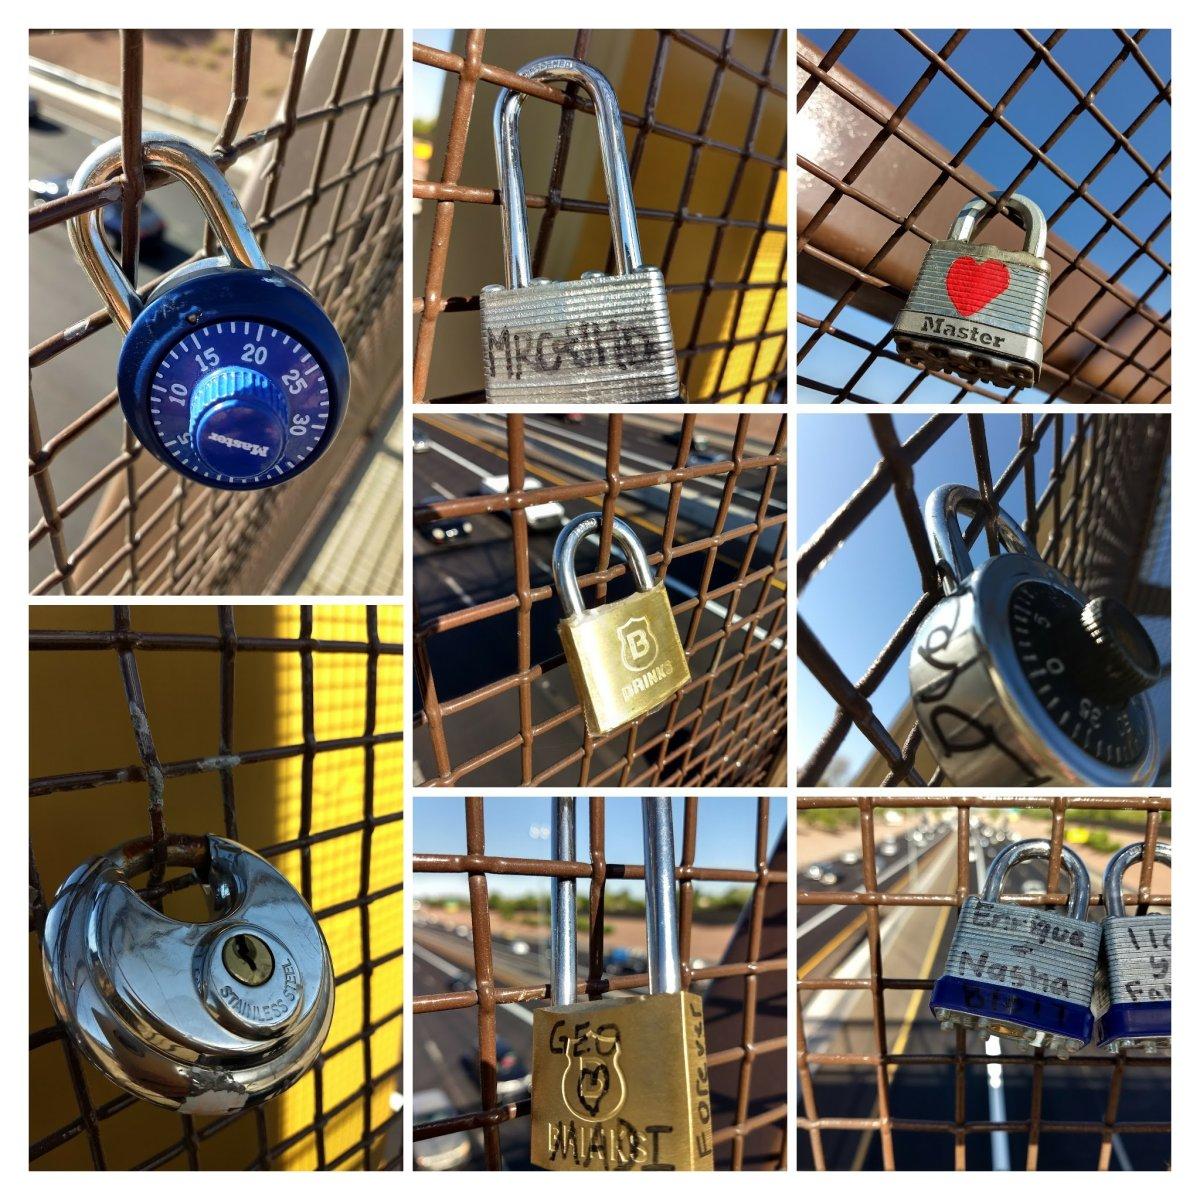 Locked!